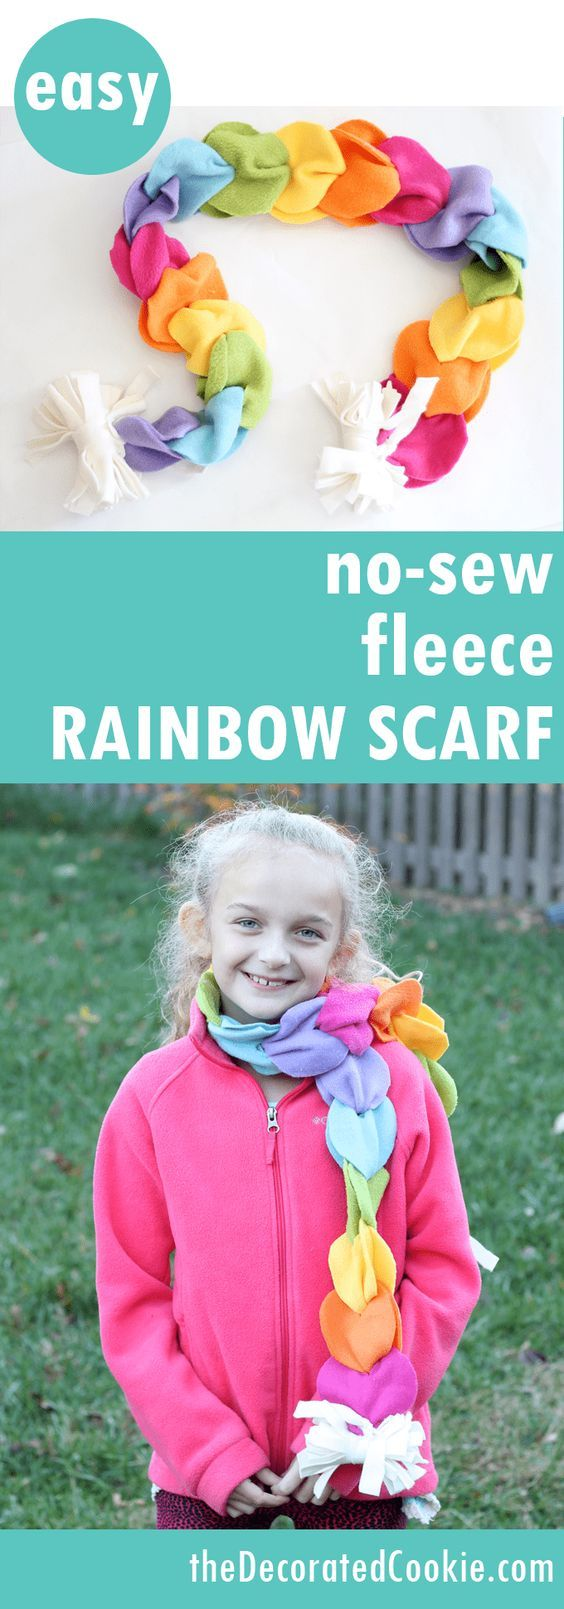 Nosew rainbow fleece scarf kidfriendly printable instructions